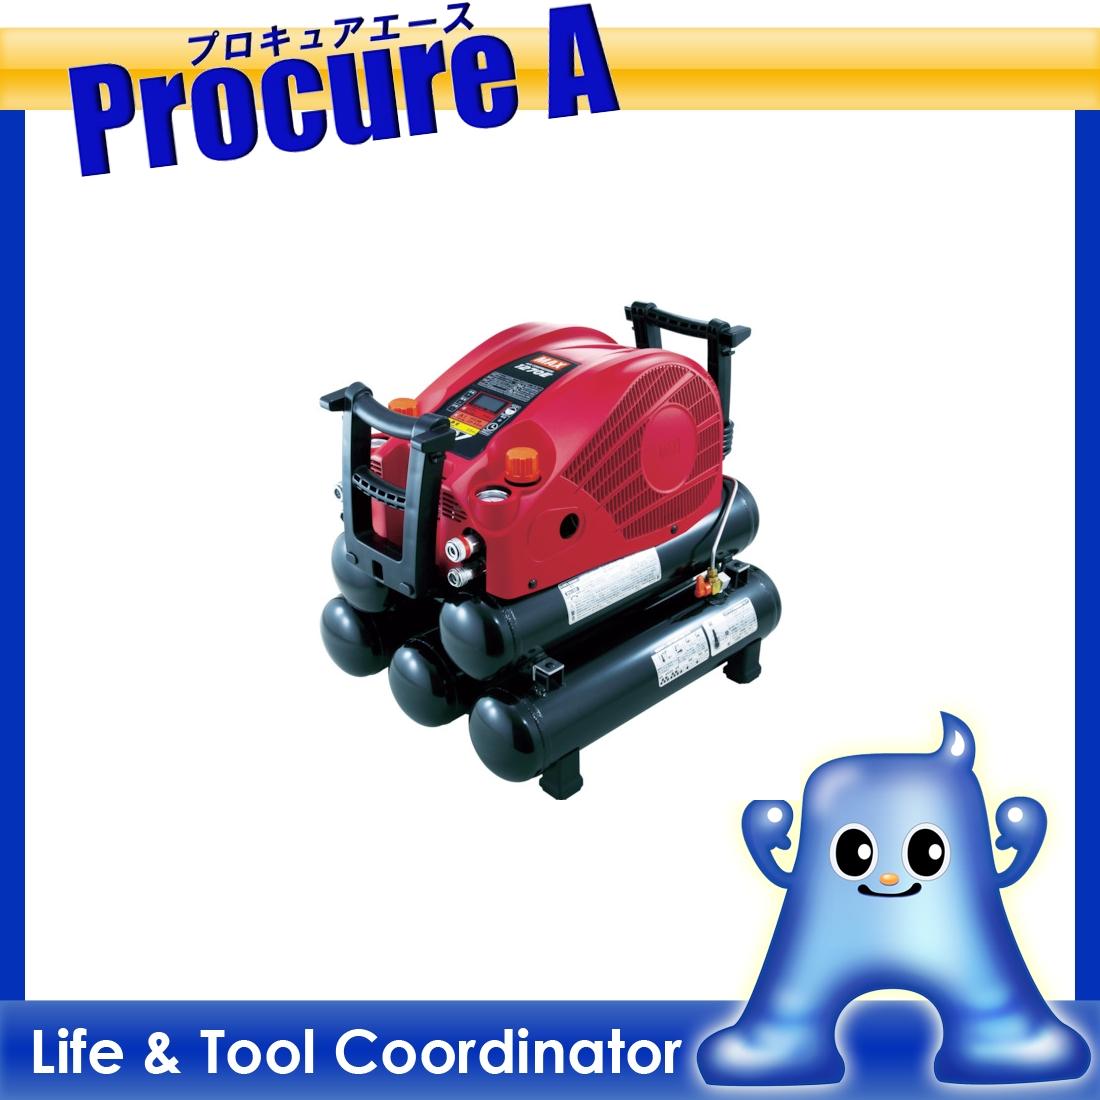 MAX 45気圧スーパーエアコンプレッサ 高圧・常圧兼用 AK-HL1270E-27L ▼779-7702 マックス(株)